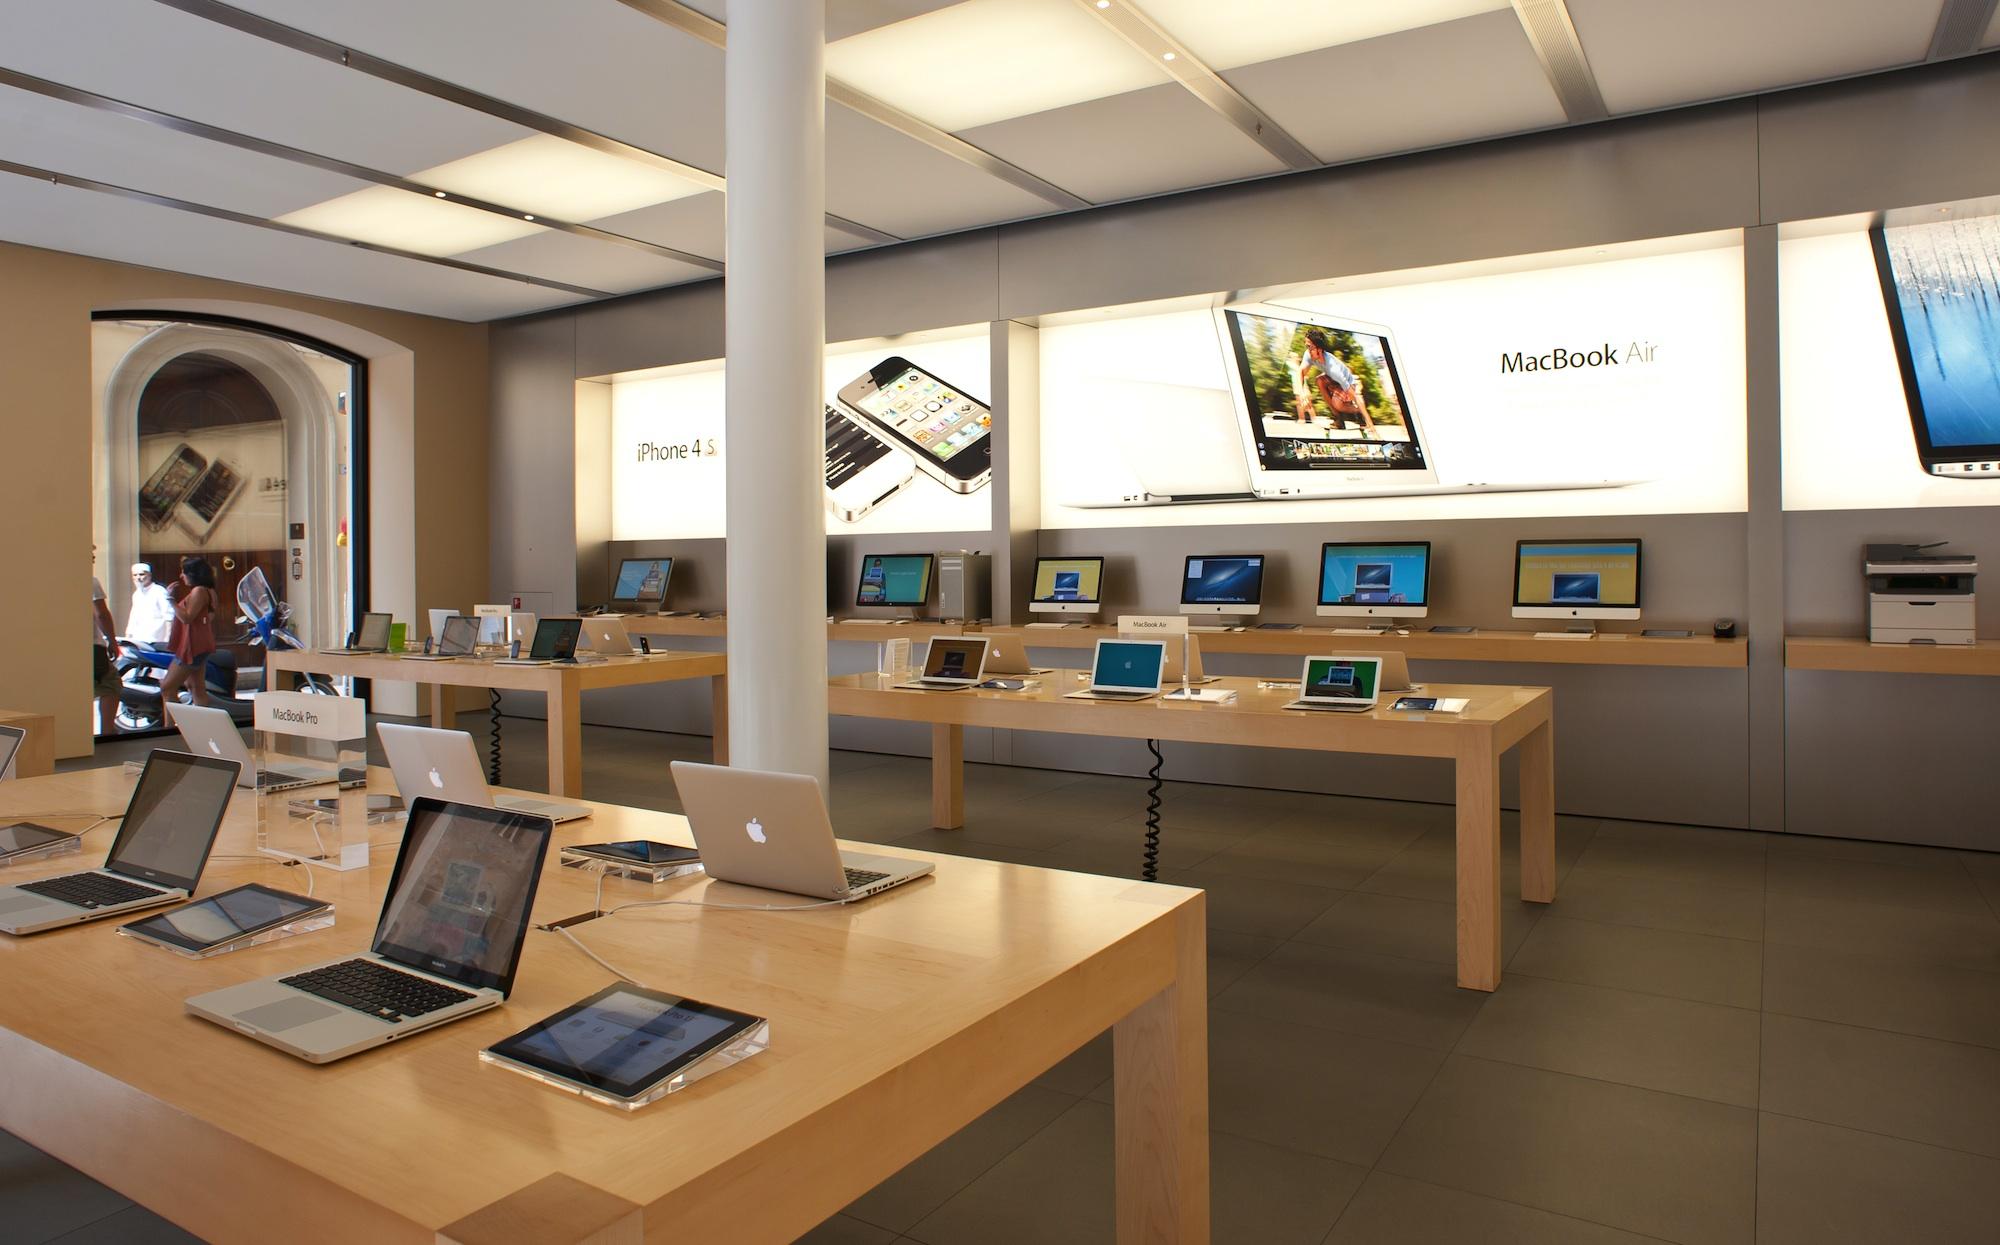 Dec 06, · reviews of Apple Store